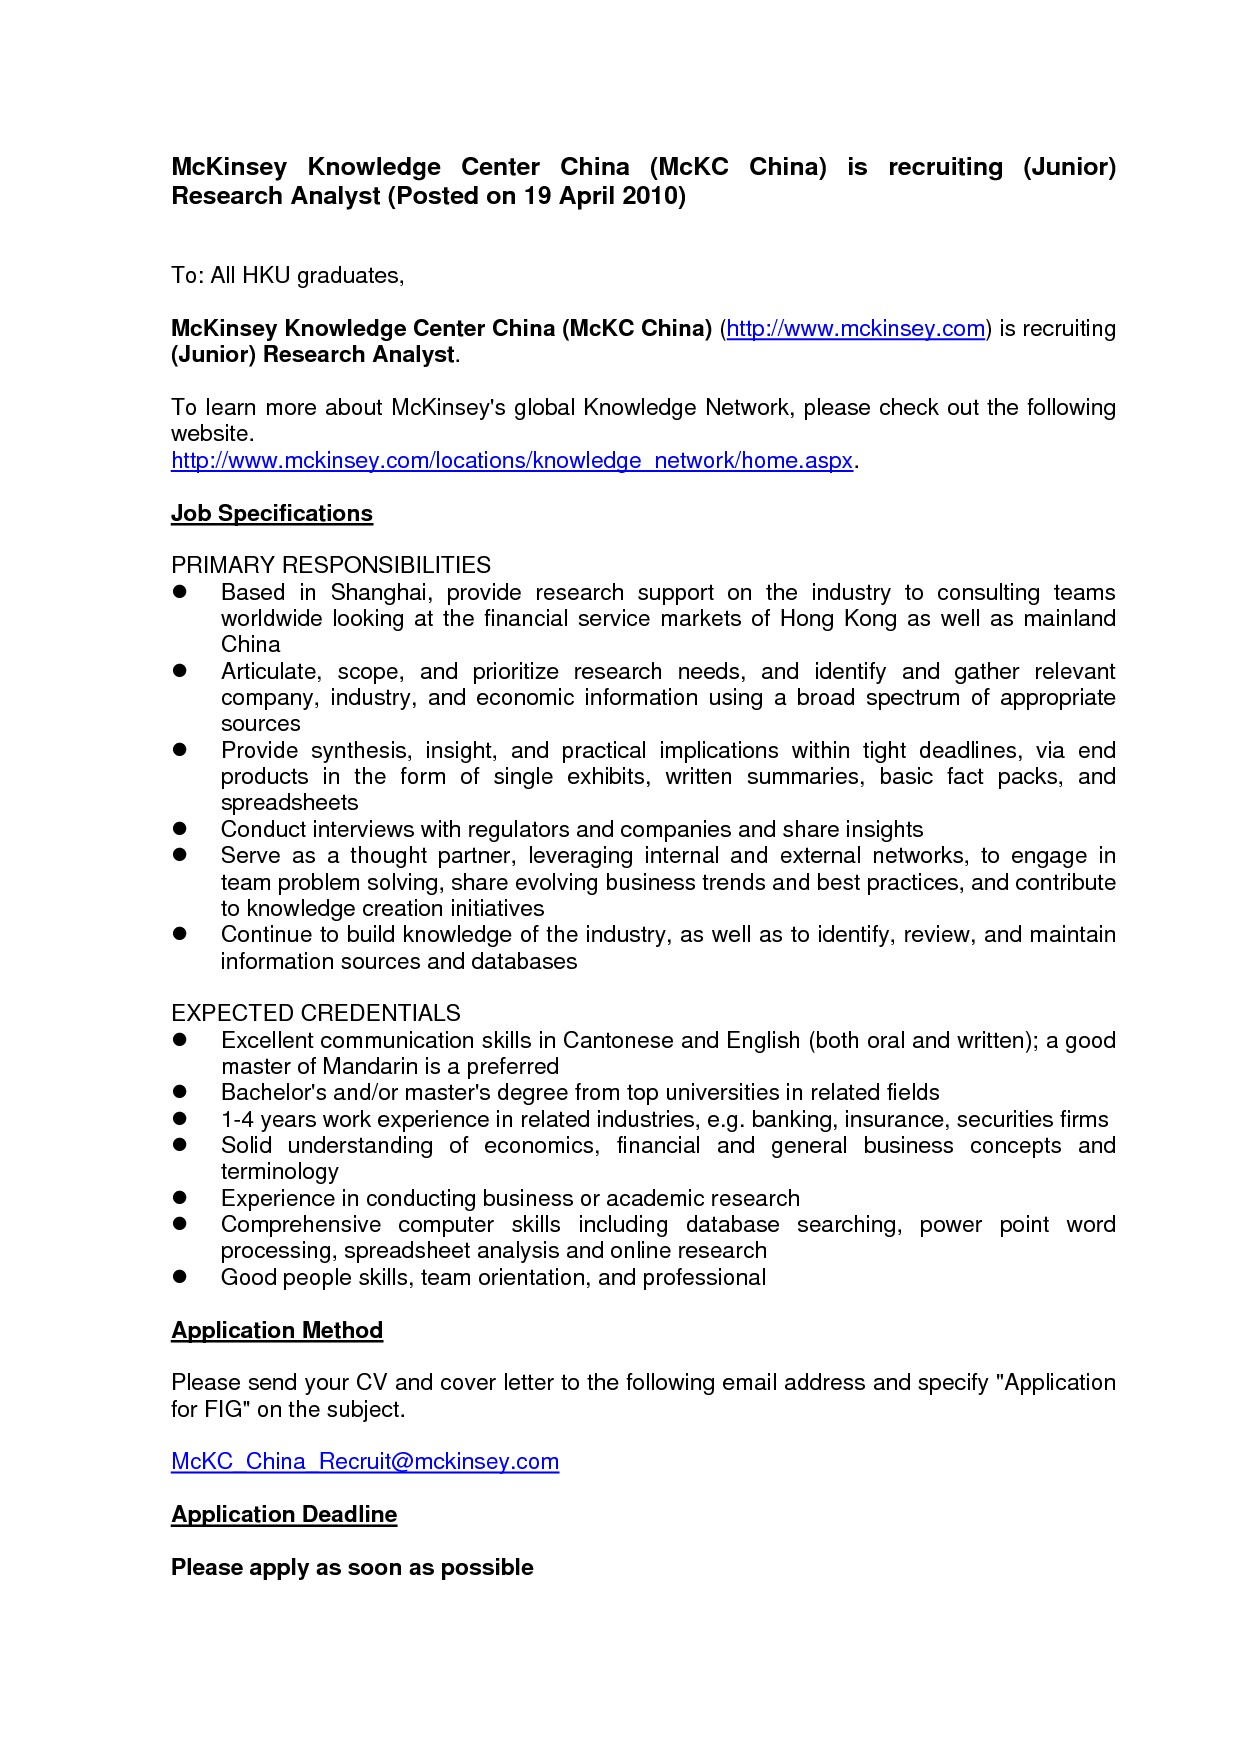 Job Reference Letter Template - Re Mendation Letter Sample for Job Valid Sample Cover Letter for